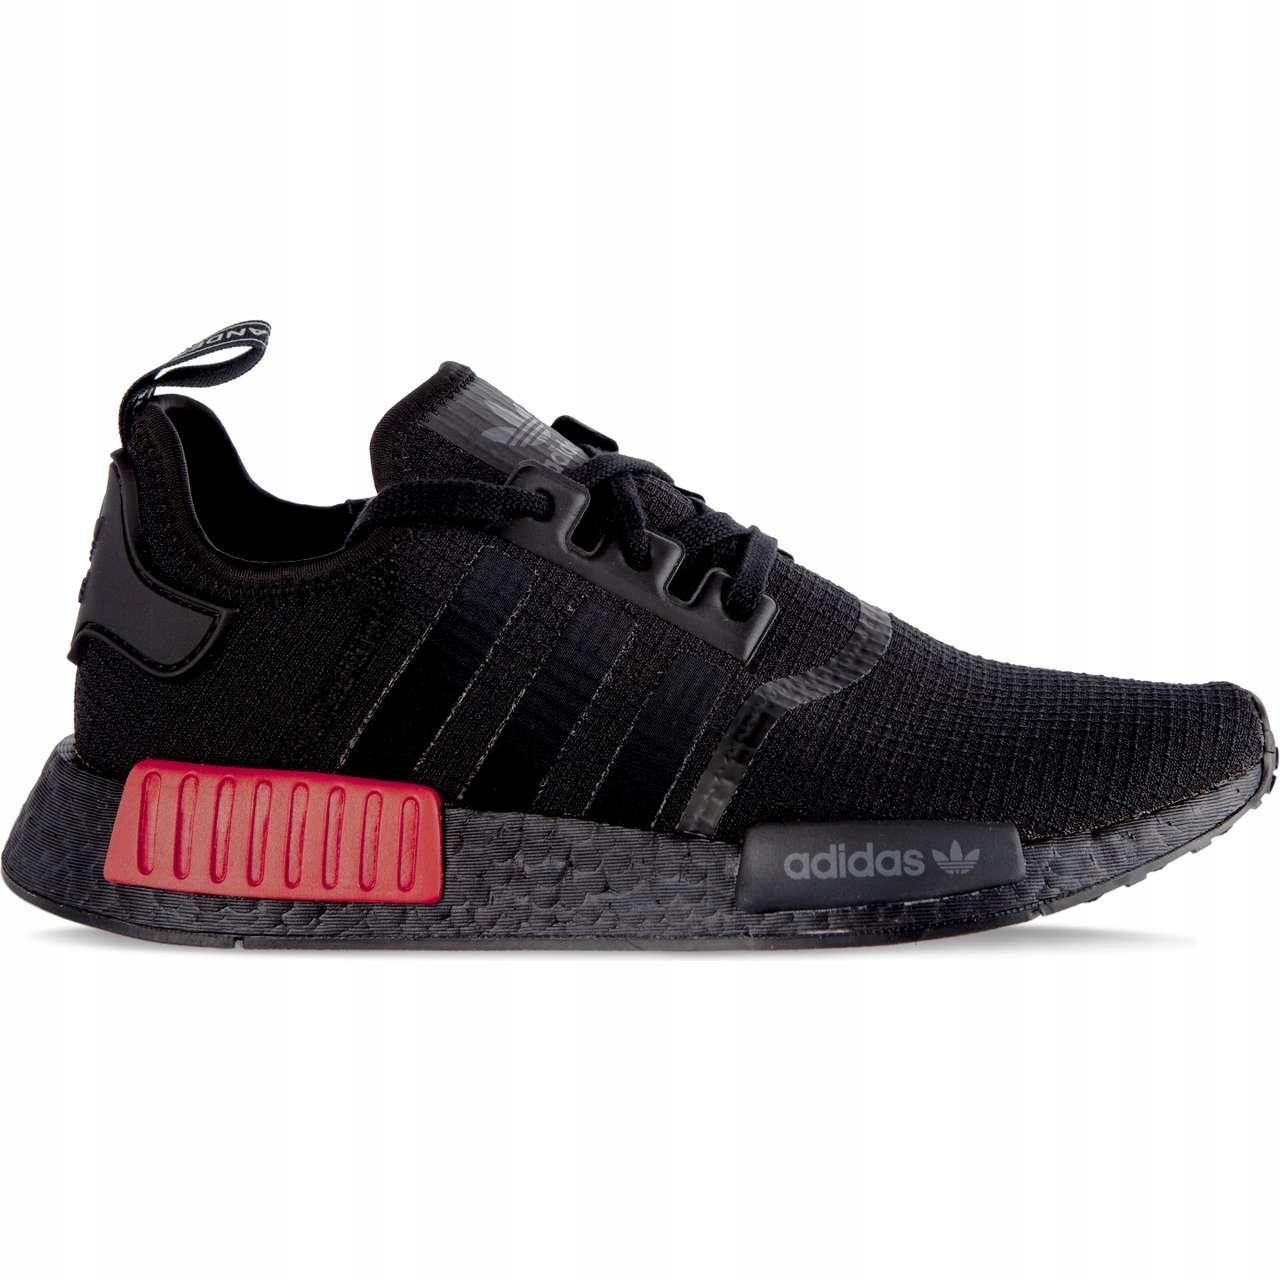 492c039b ADIDAS NMD_R1 (42 2/3) Uniseks Sneakersy - 7607637037 - oficjalne ...